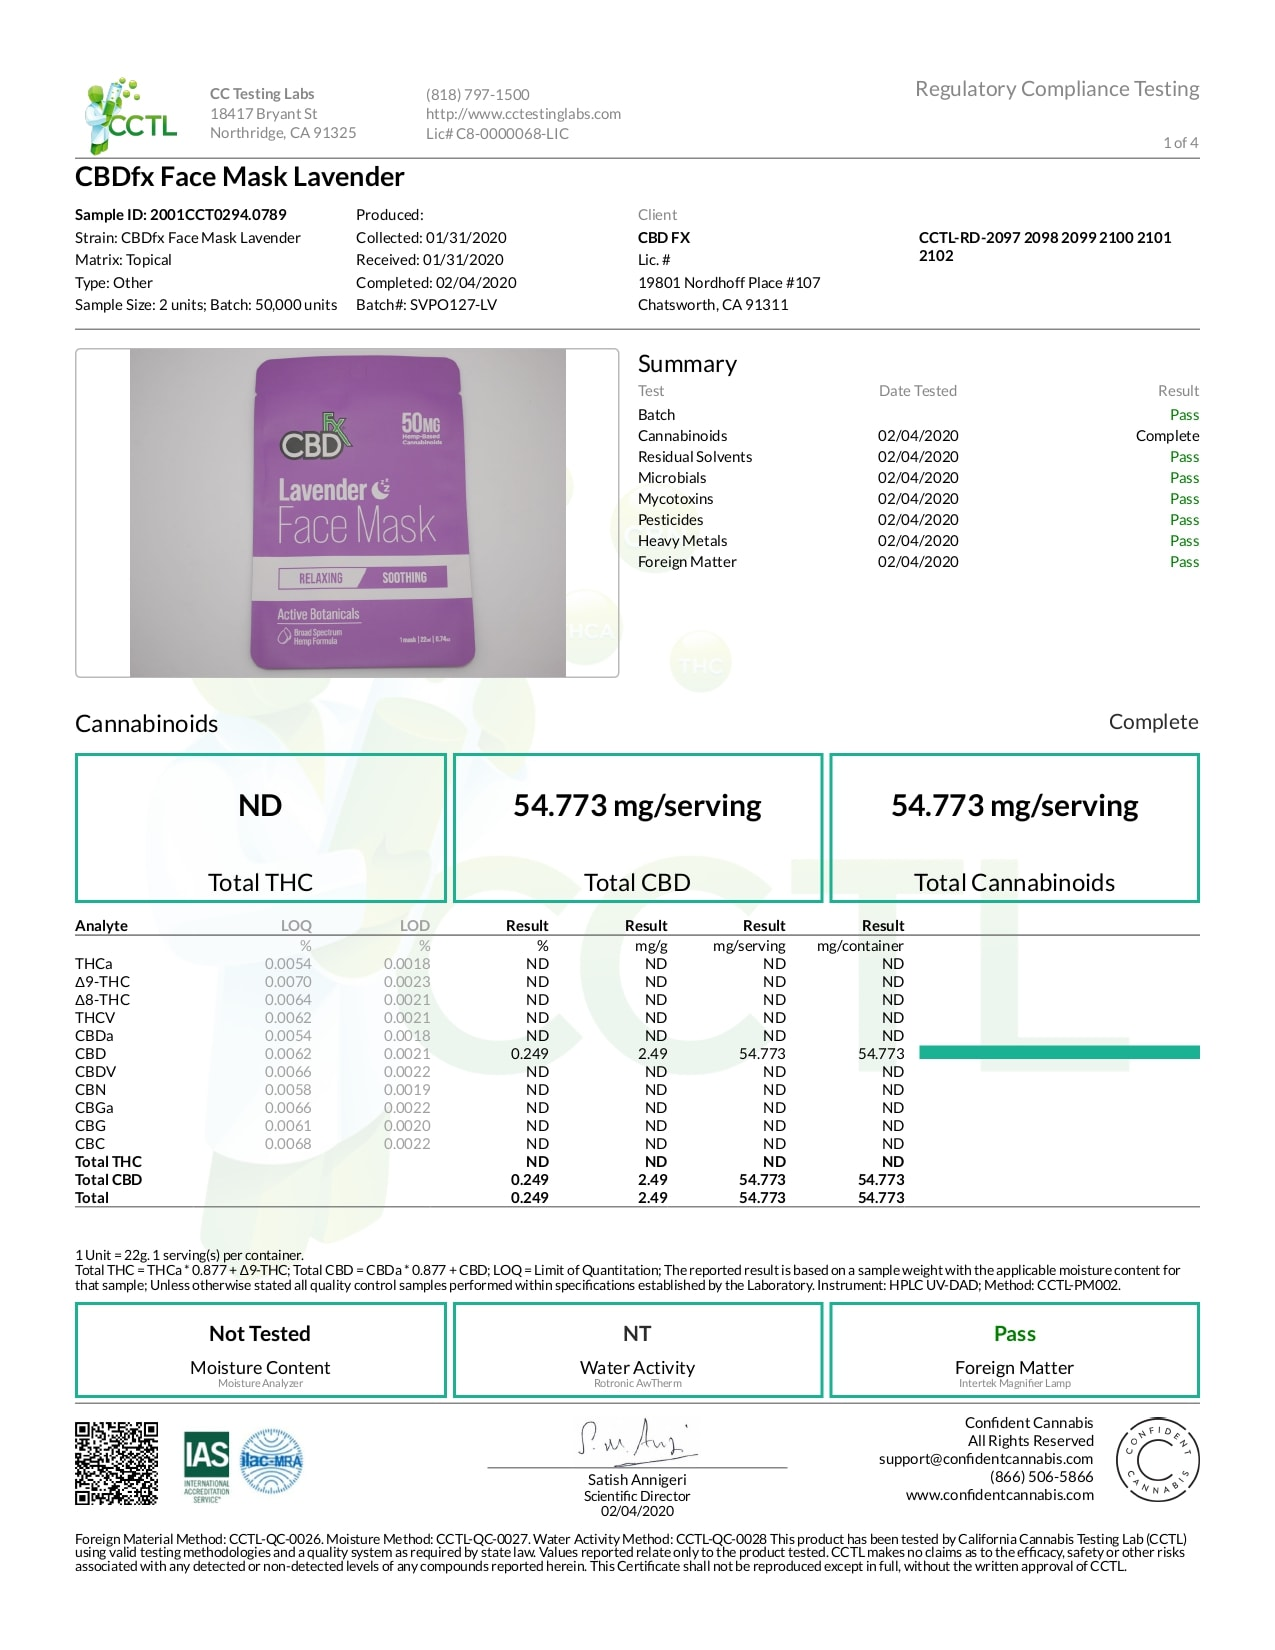 CBDfx CBD Lavender Face Mask Lab Report Broad Spectrum 50mg